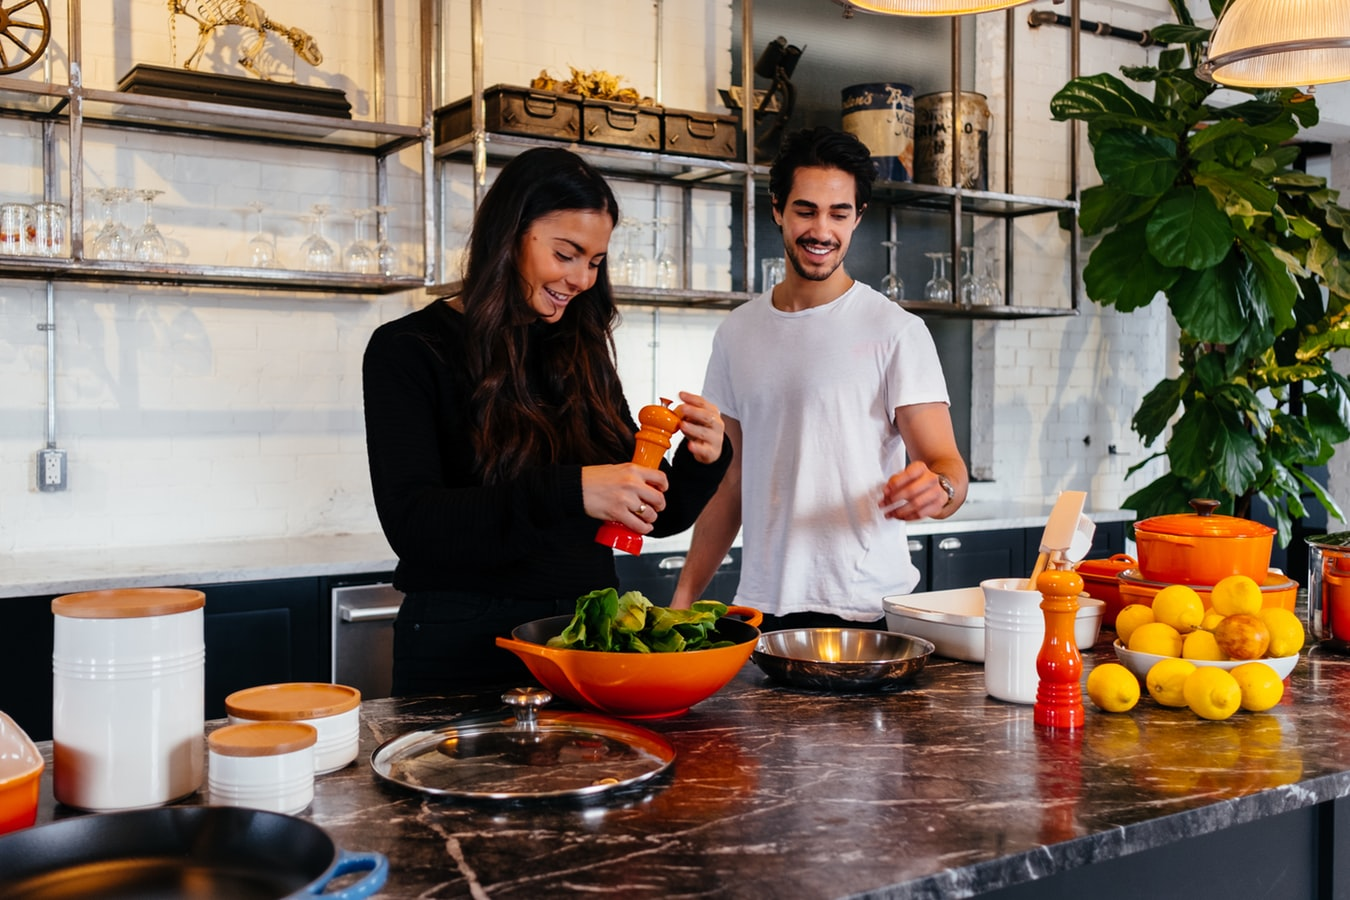 5 recetas de 5 chefs famosos para lucirte en la cocina